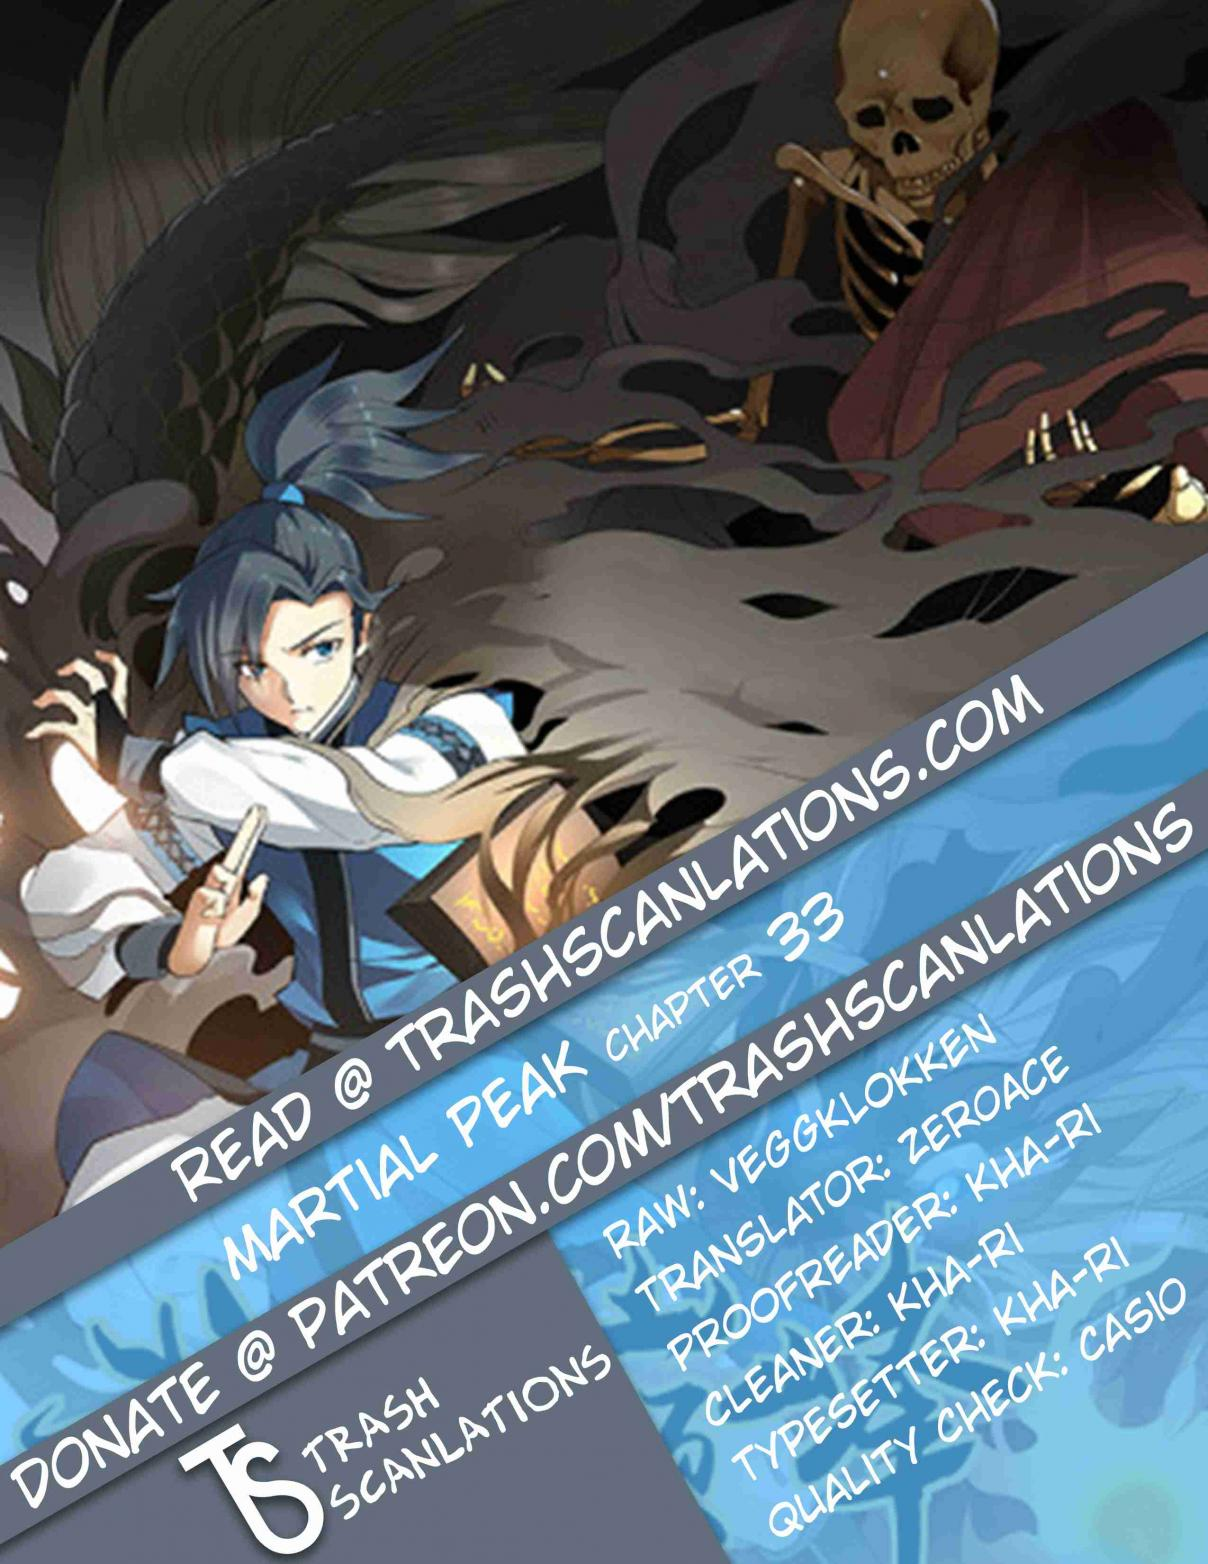 https://im.nineanime.com/comics/pic9/17/21329/500192/f45fe3f64d37932f037761c6bf9a46db.jpg Page 1